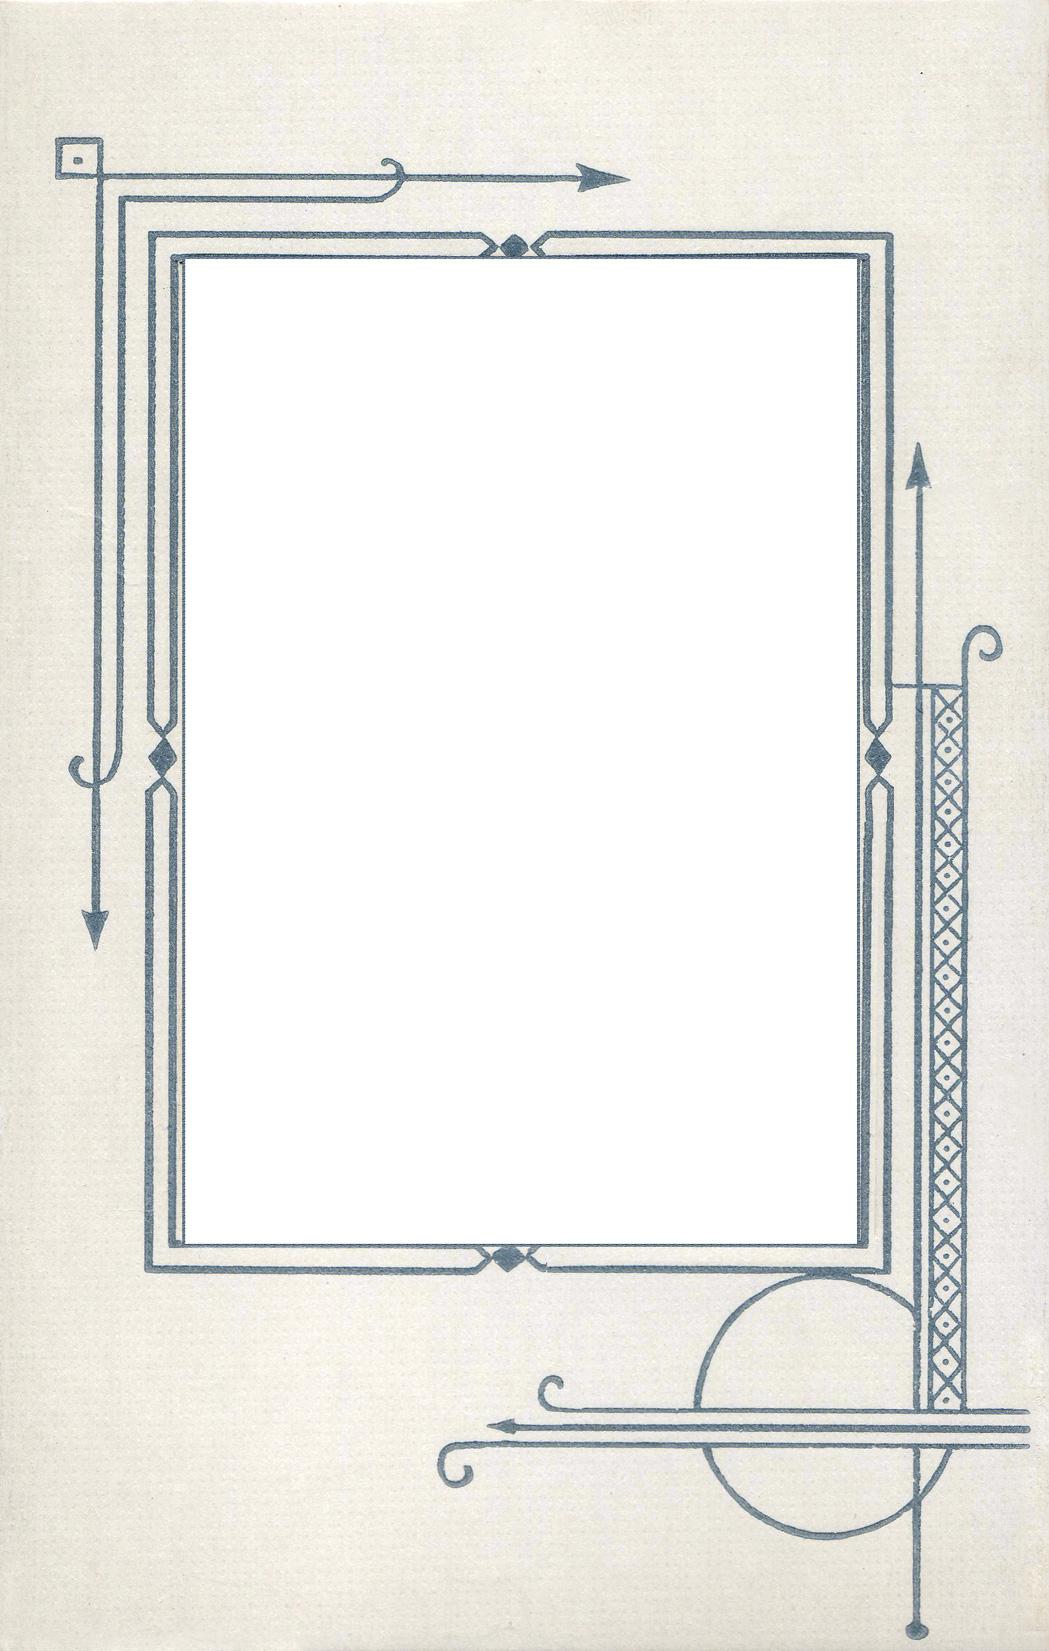 art-deco-art-deco-frame-desktop-download-art-deco-frame-in-wallpaper-wp5603019